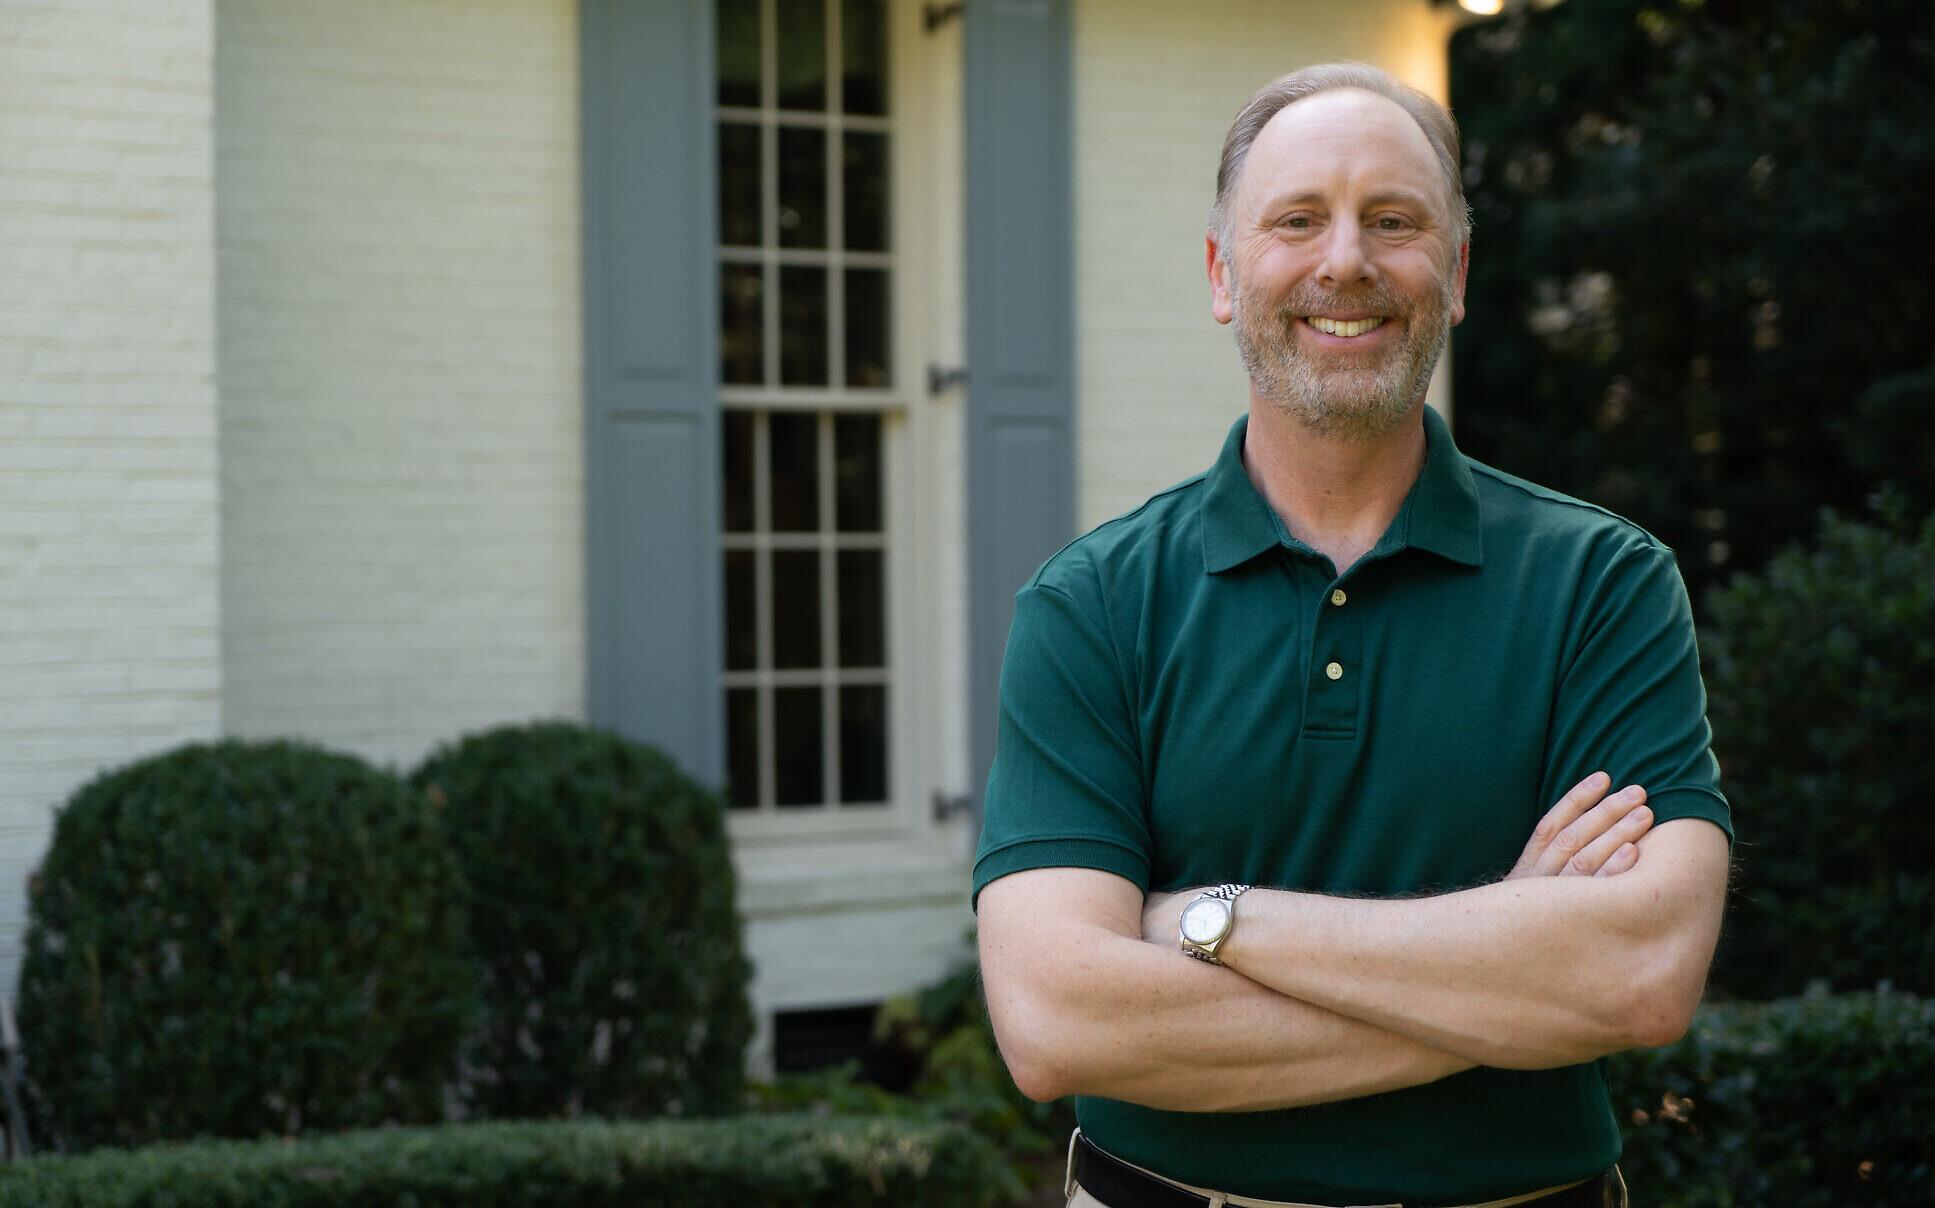 Georgia Democratic Senate candidate Matt Lieberman, son of former senator Joe Lieberman, stands in front of his home in Georgia (Courtesy)